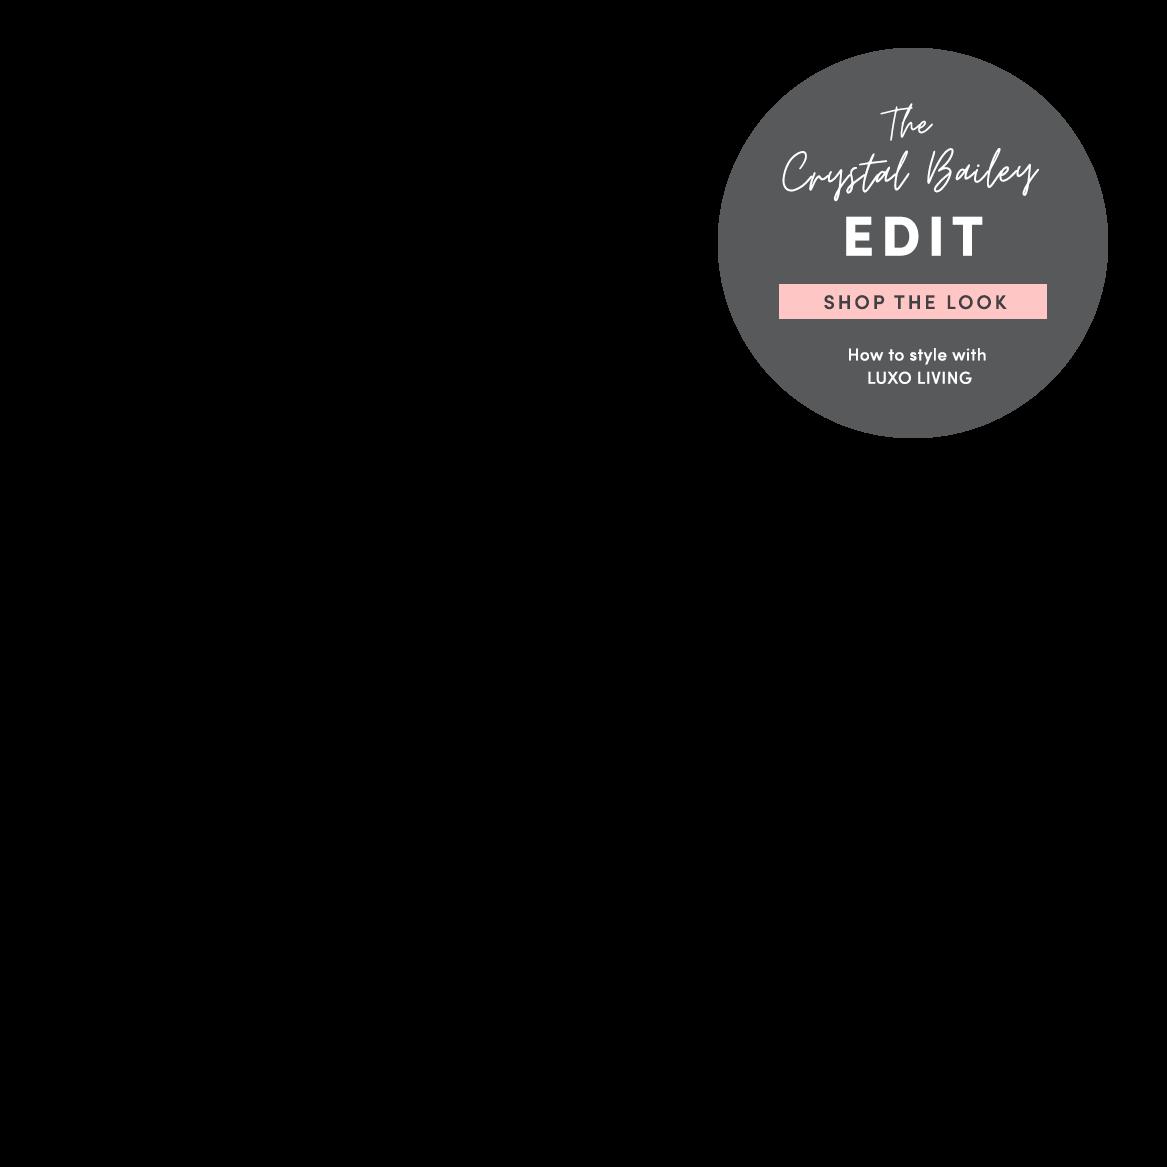 The Crystal Bailey Edit. Shop Now